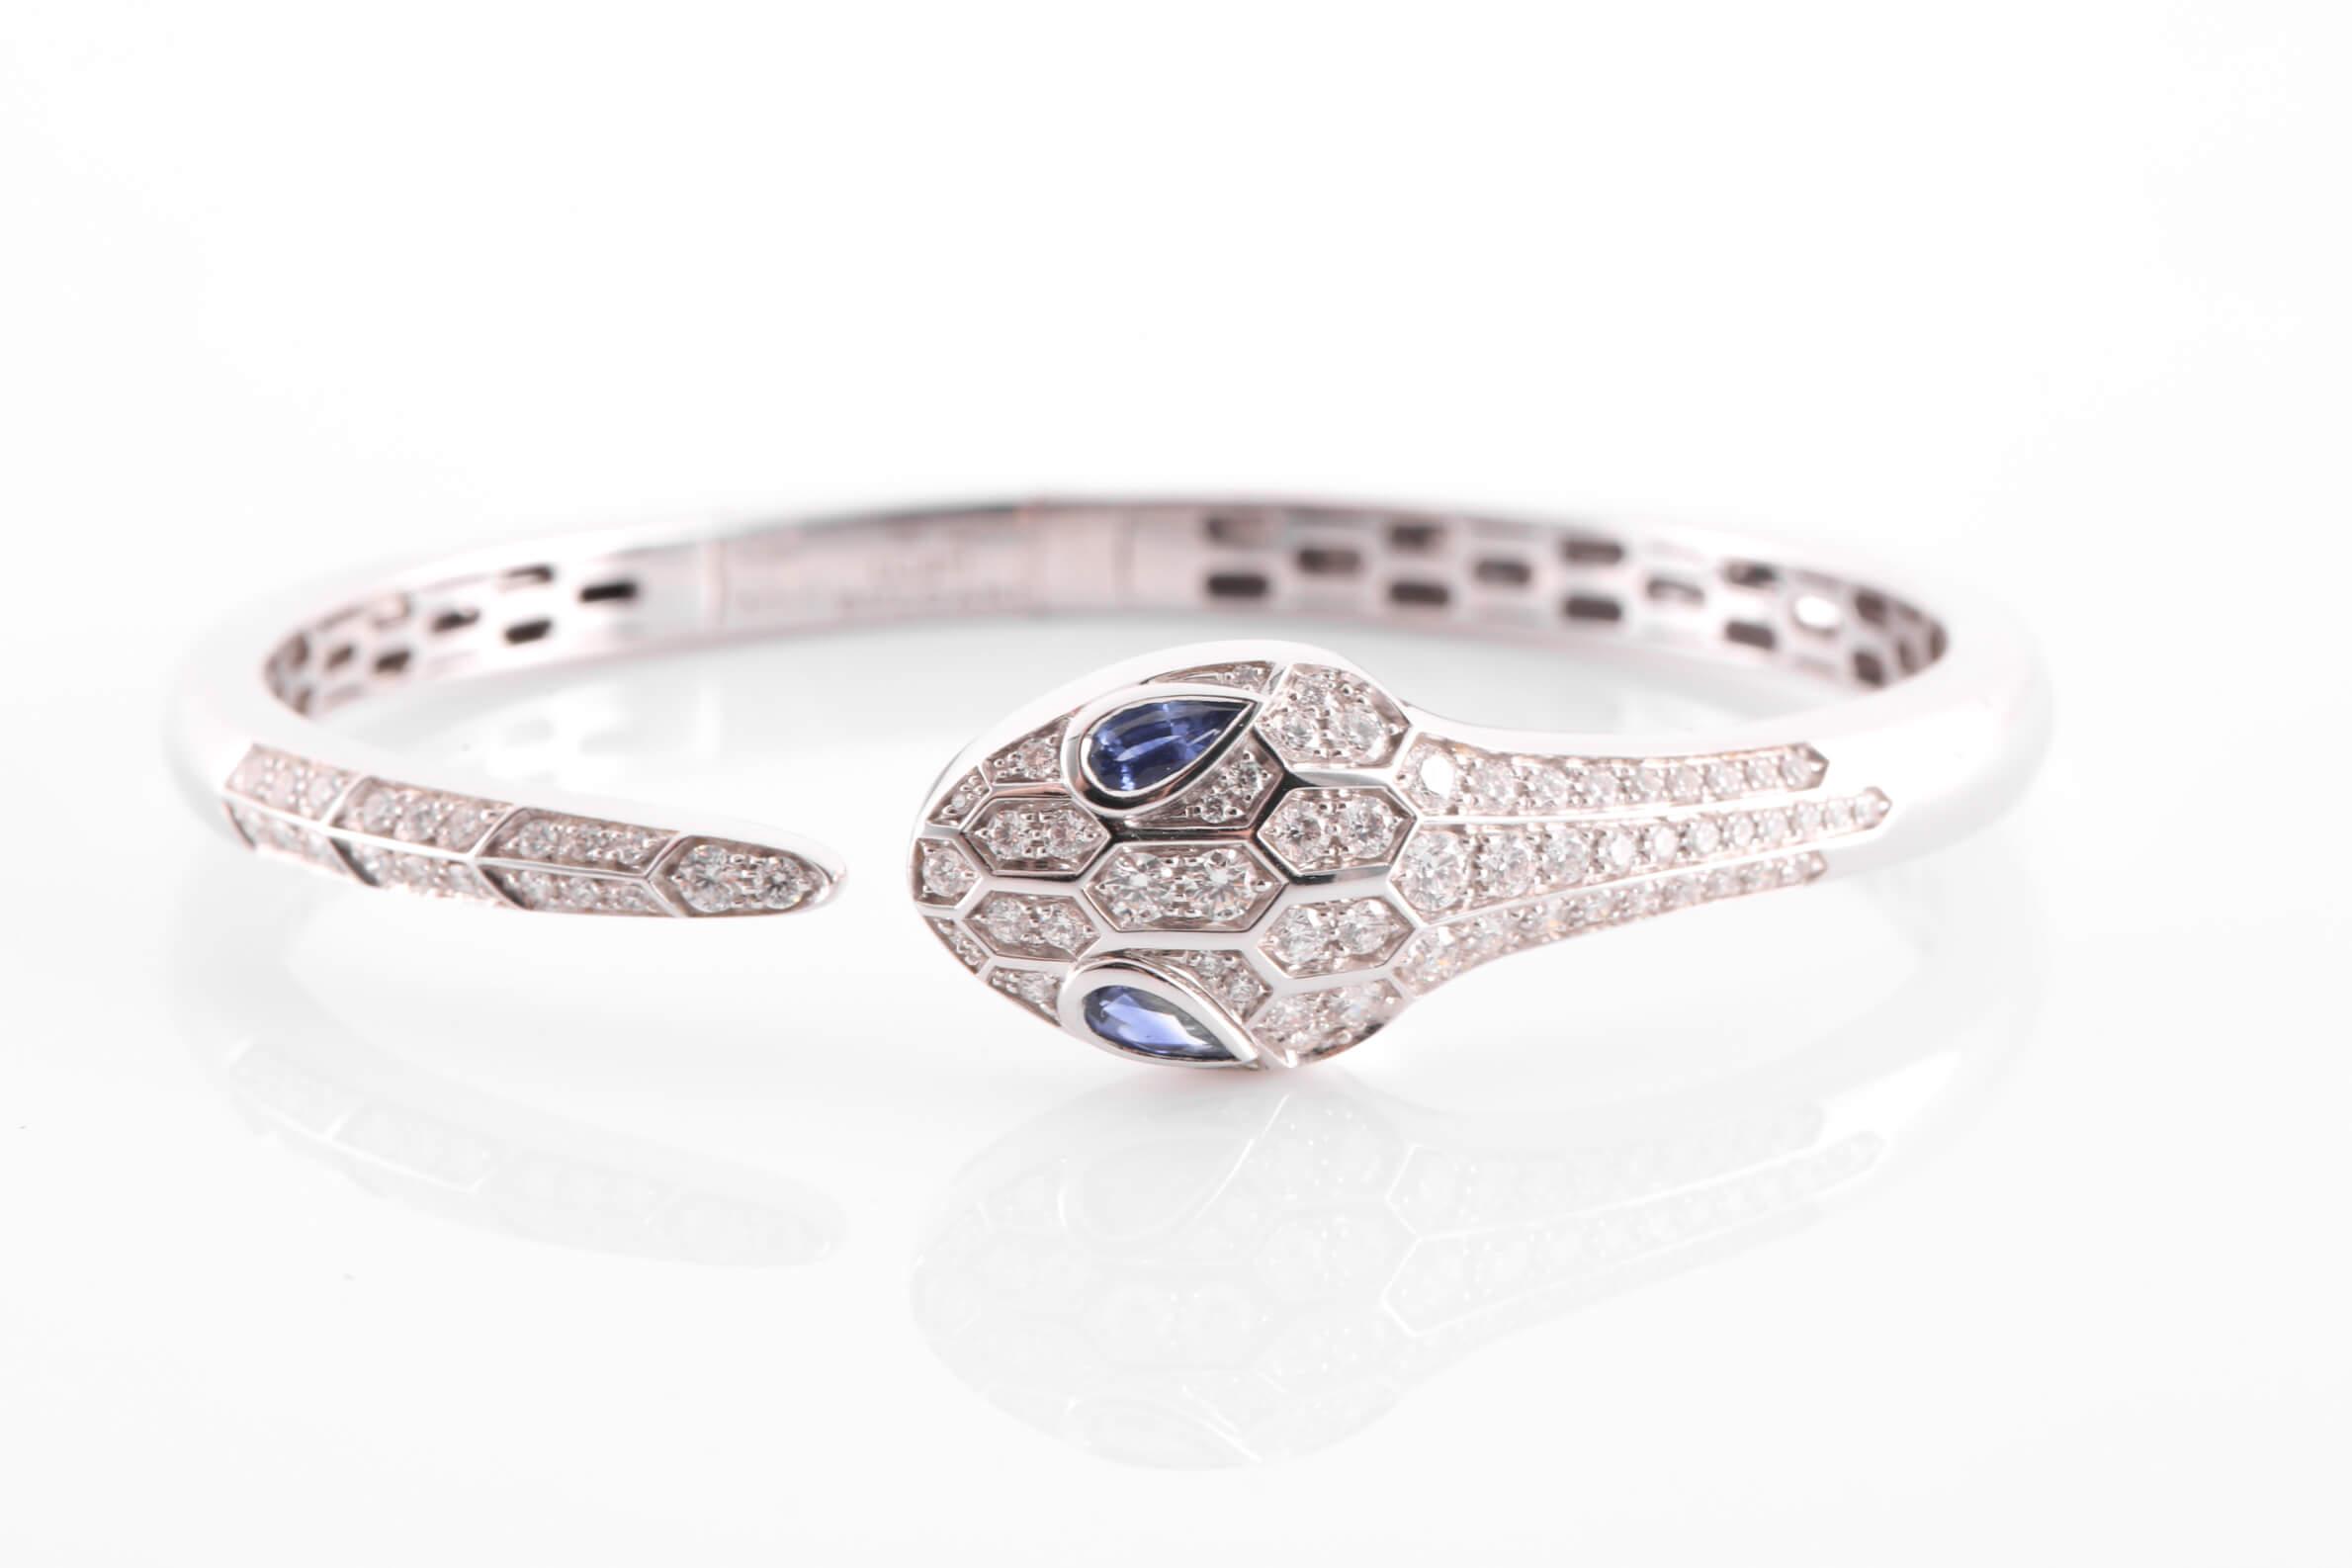 Bulgari 18 carat white gold, sapphire and diamond Serpenti bracelet